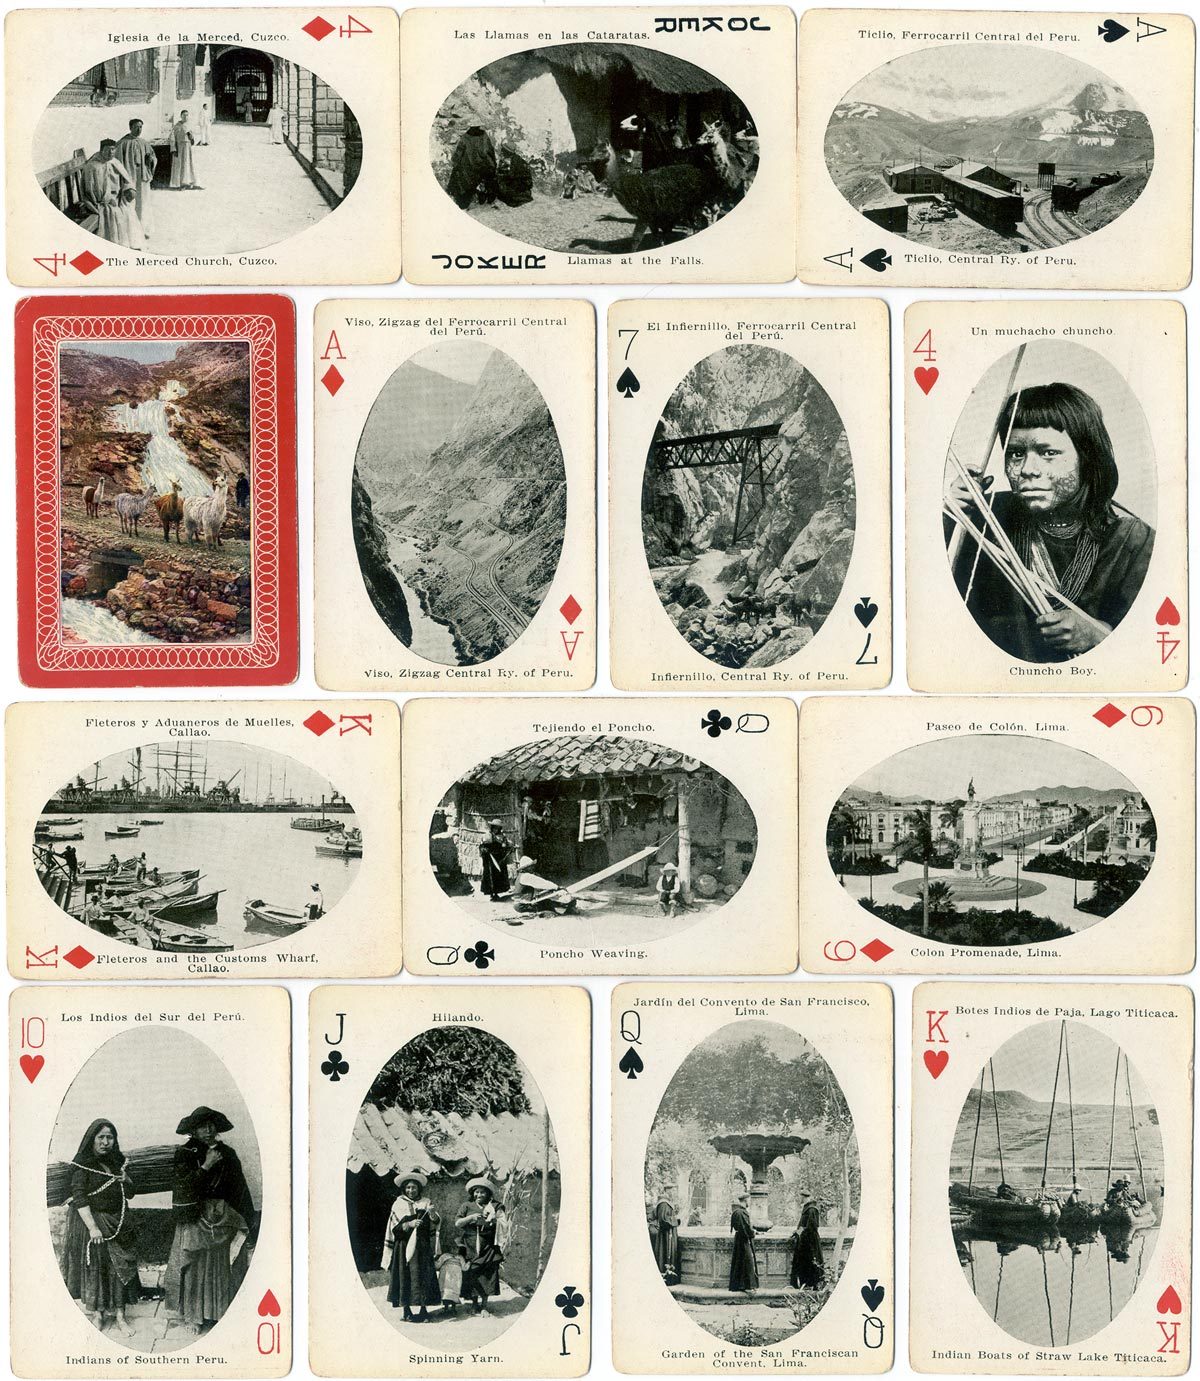 Vistas del Perú souvenir deck, made in USA and imported by Edw. E. Muecke, Lima, Peru, c.1940